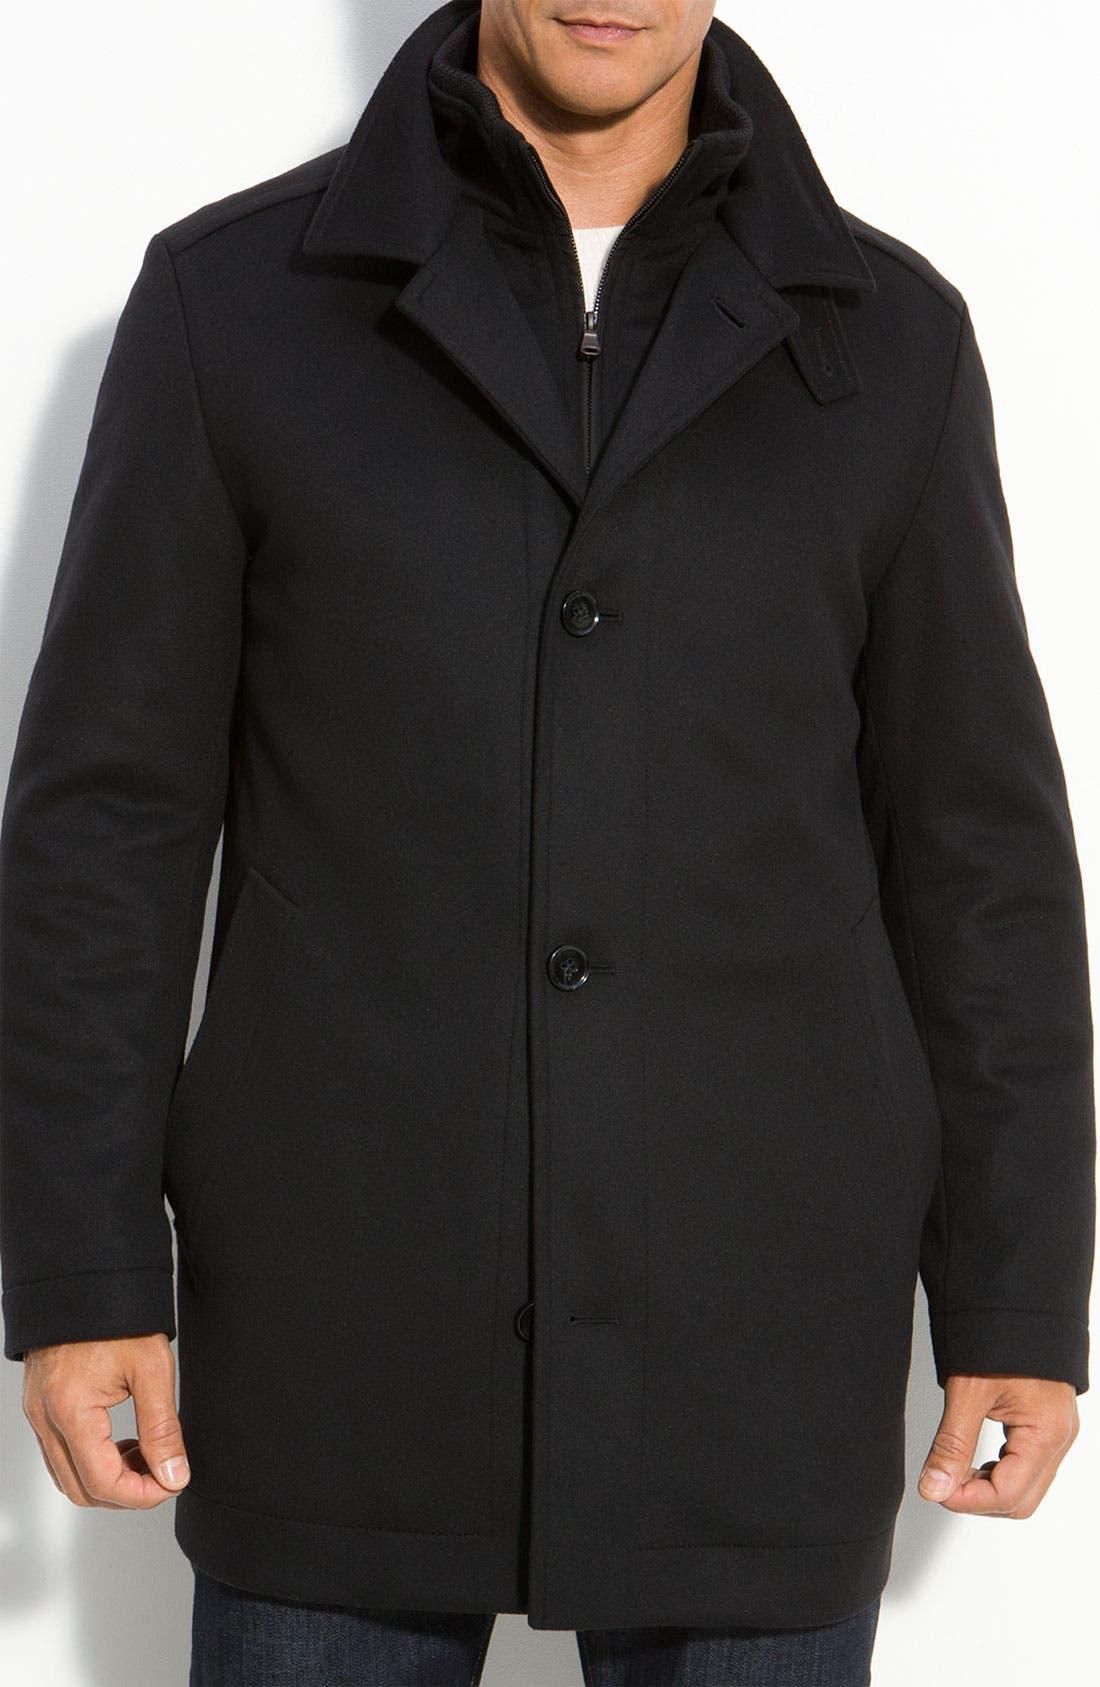 HUGO BOSS 'Coxtan' Wool & Cashmere Coat, Main, color, 001